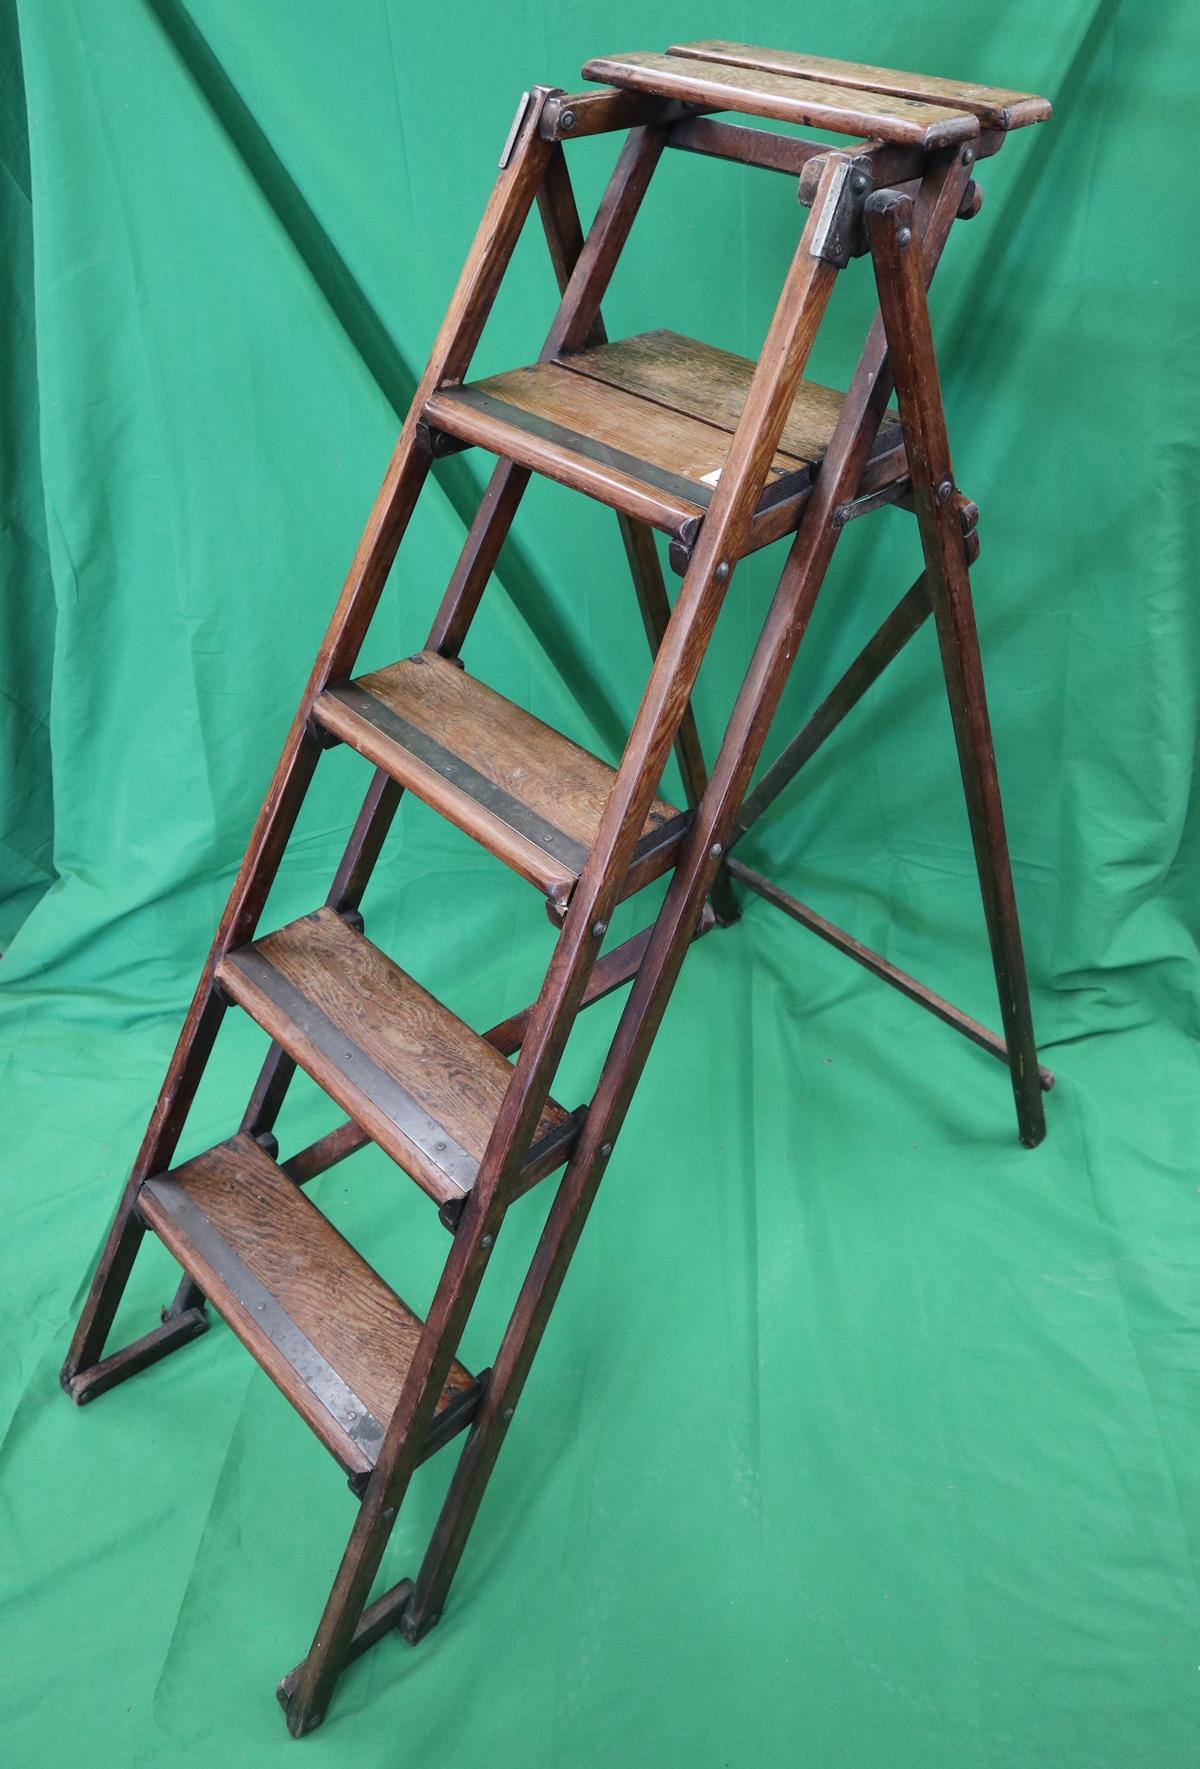 Vintage good quality step ladders